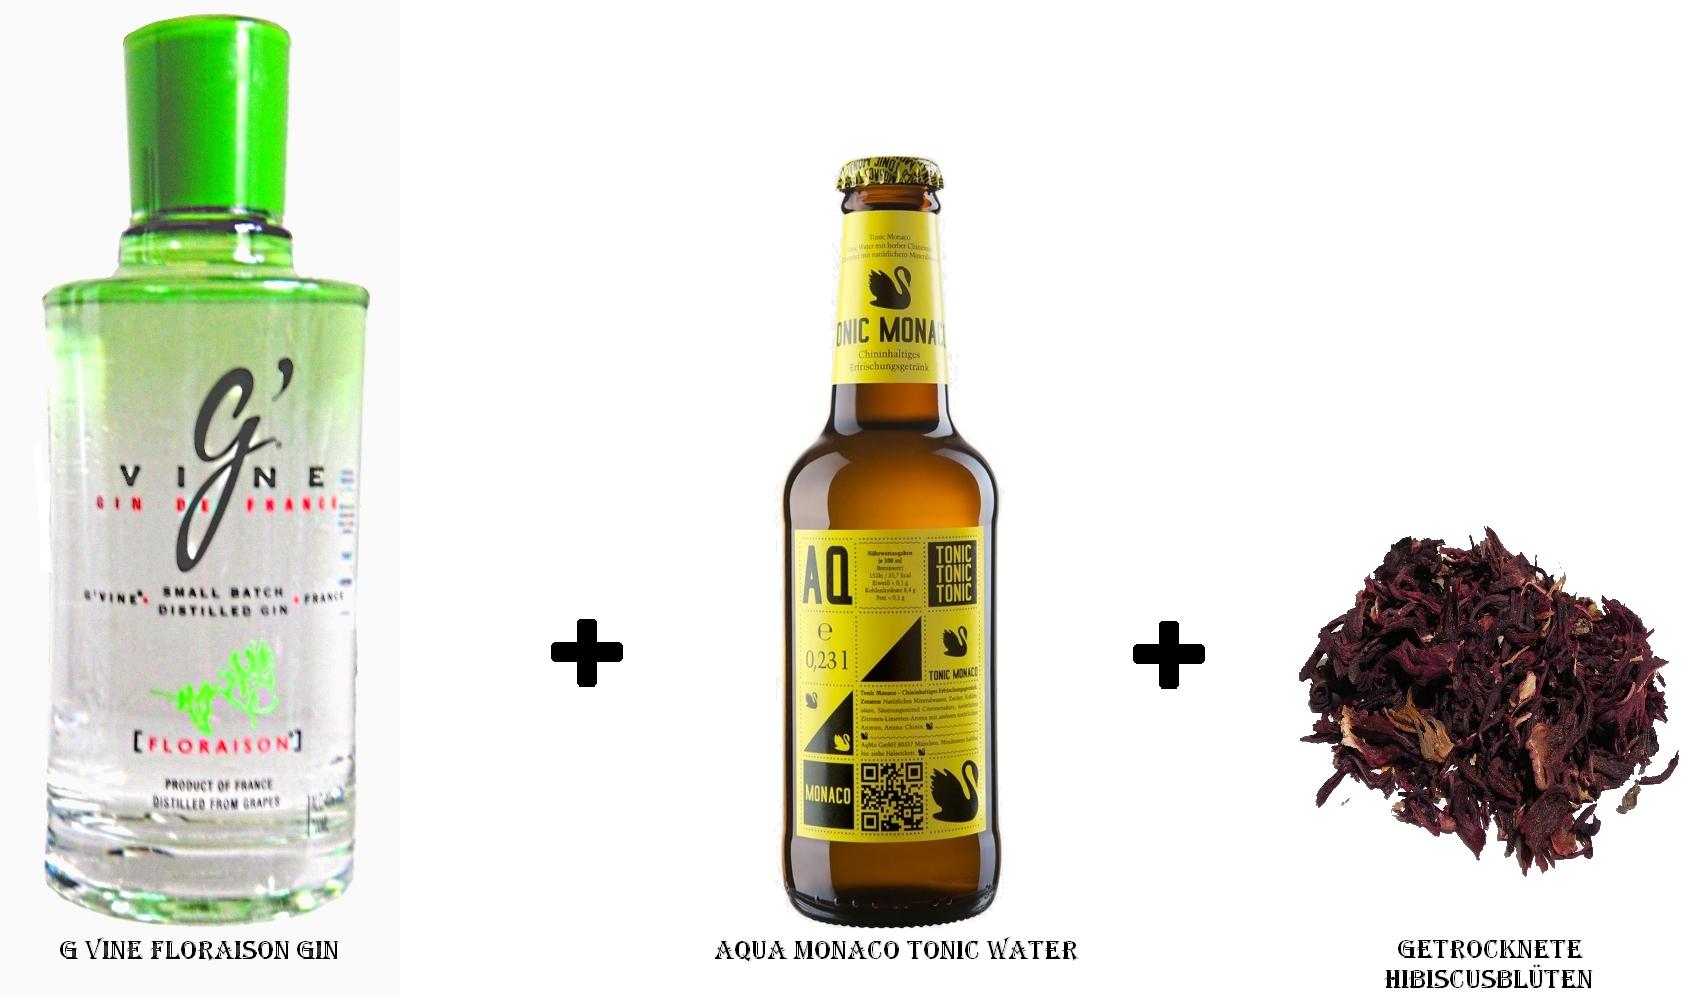 G Vine Floraison Gin + Aqua Monaco Tonic Water + Hibiscusblüte